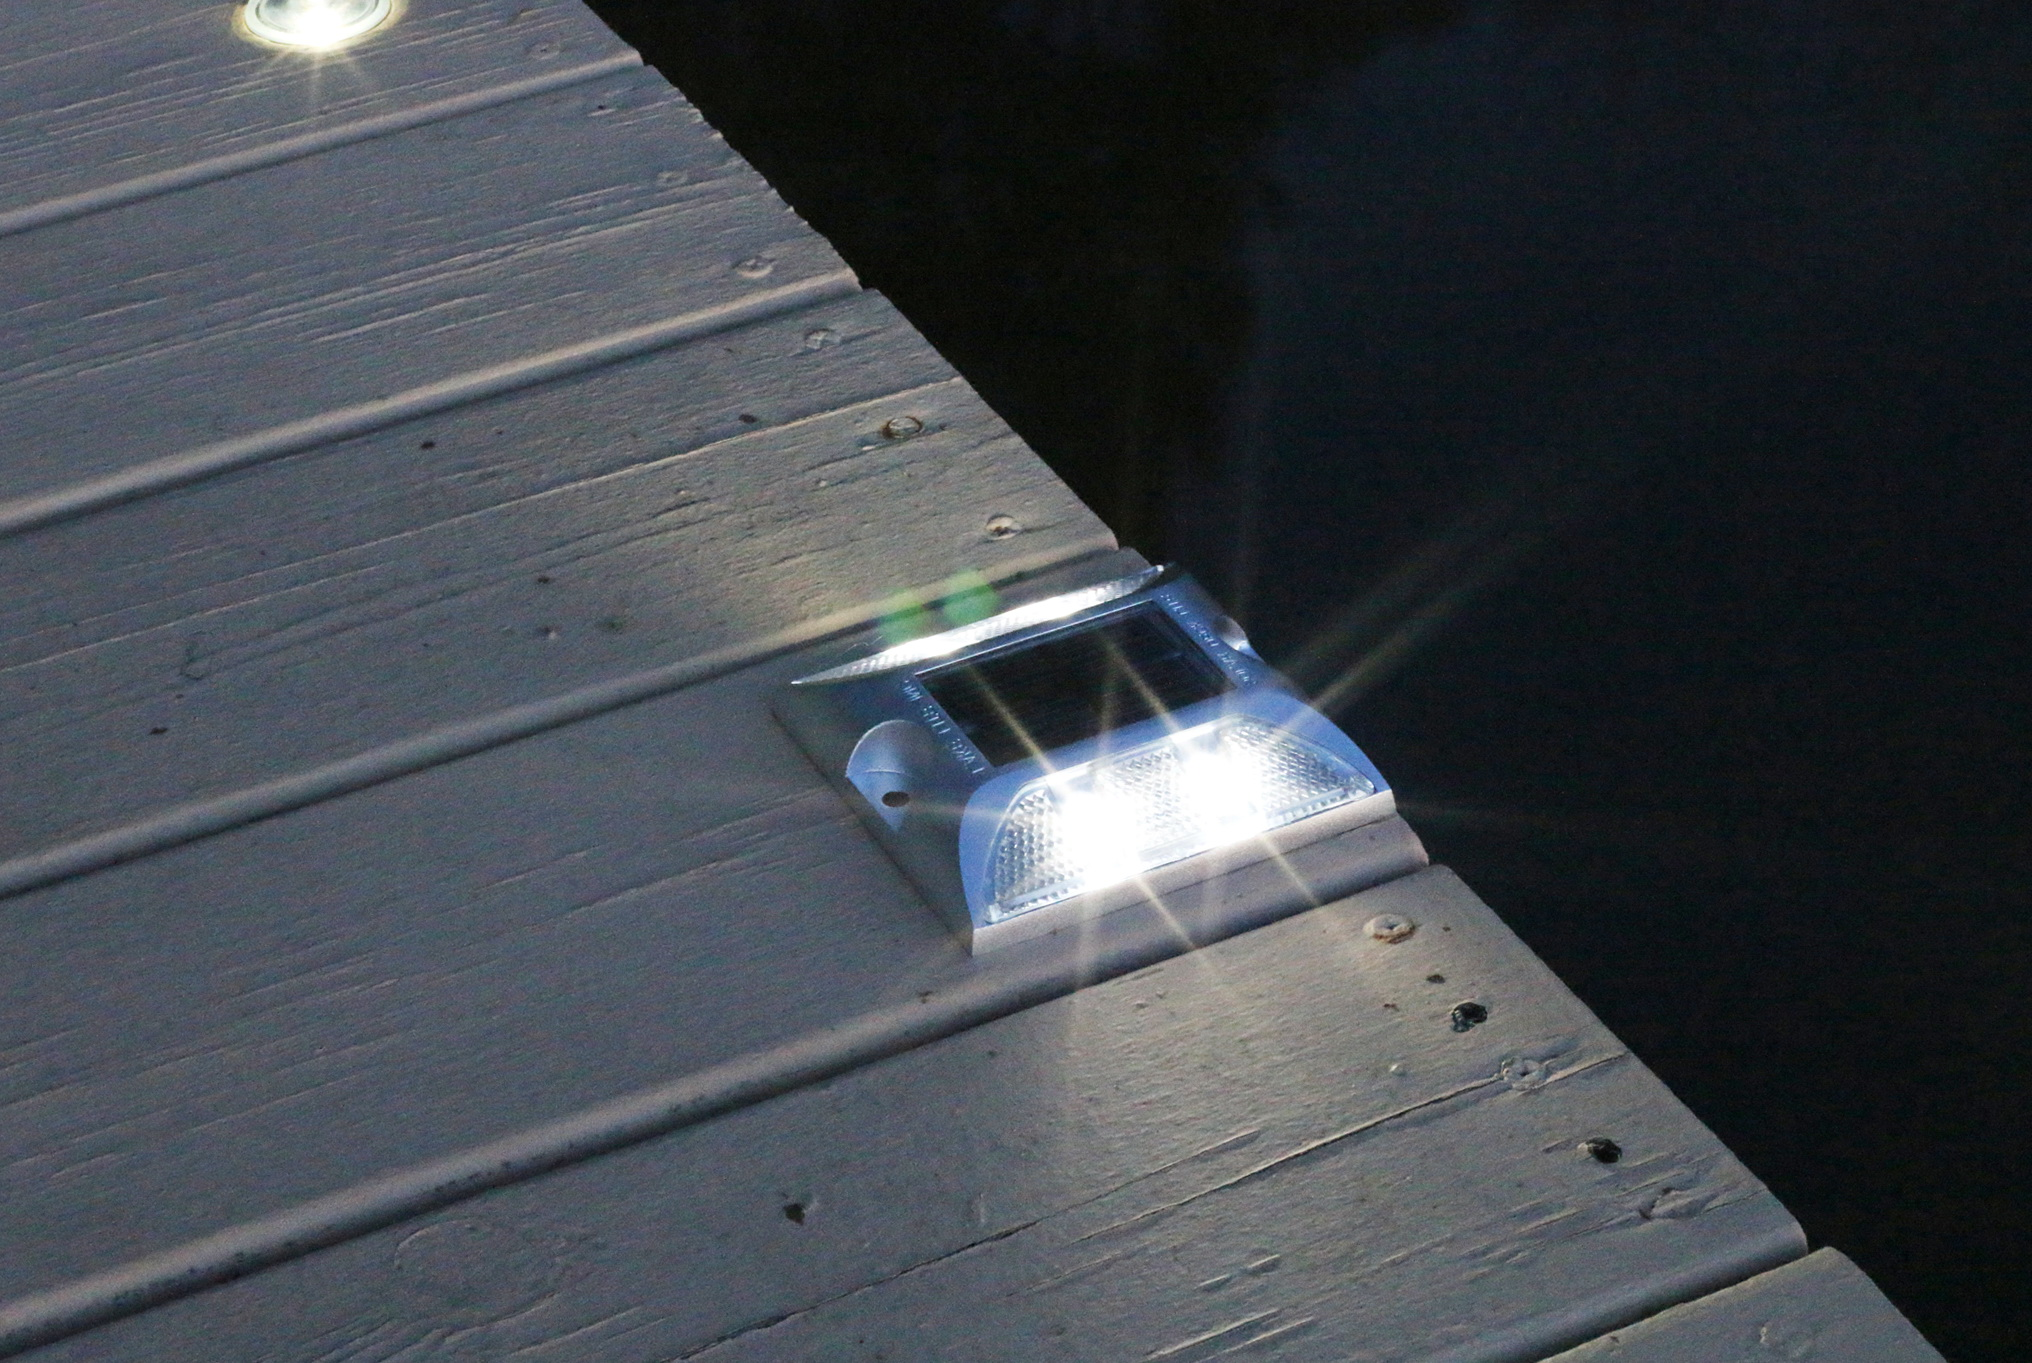 Solar deck lighting lowes home design ideas solar deck lighting lowes aloadofball Image collections